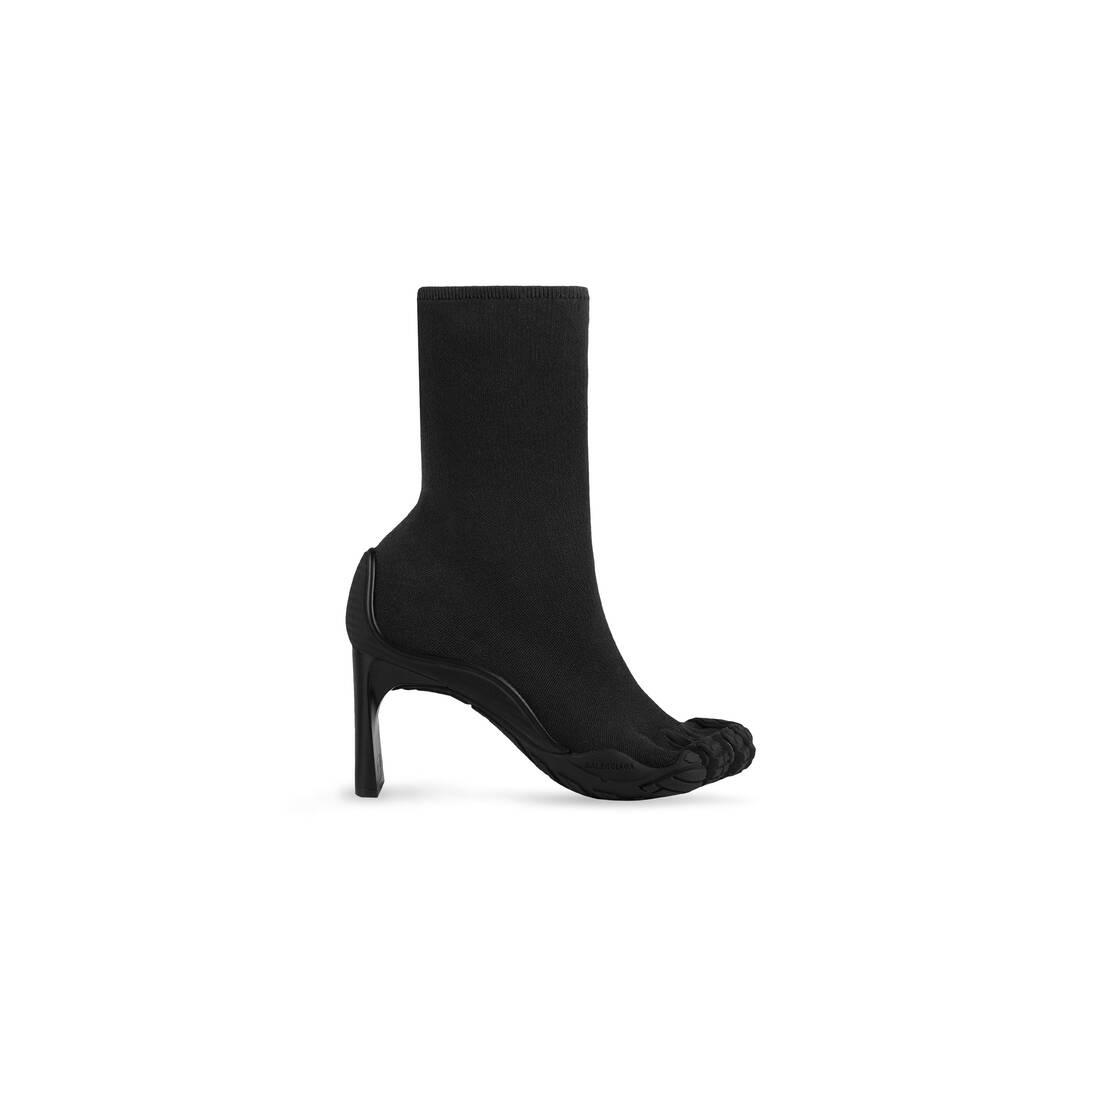 Display zoomed version of heeled toe  1